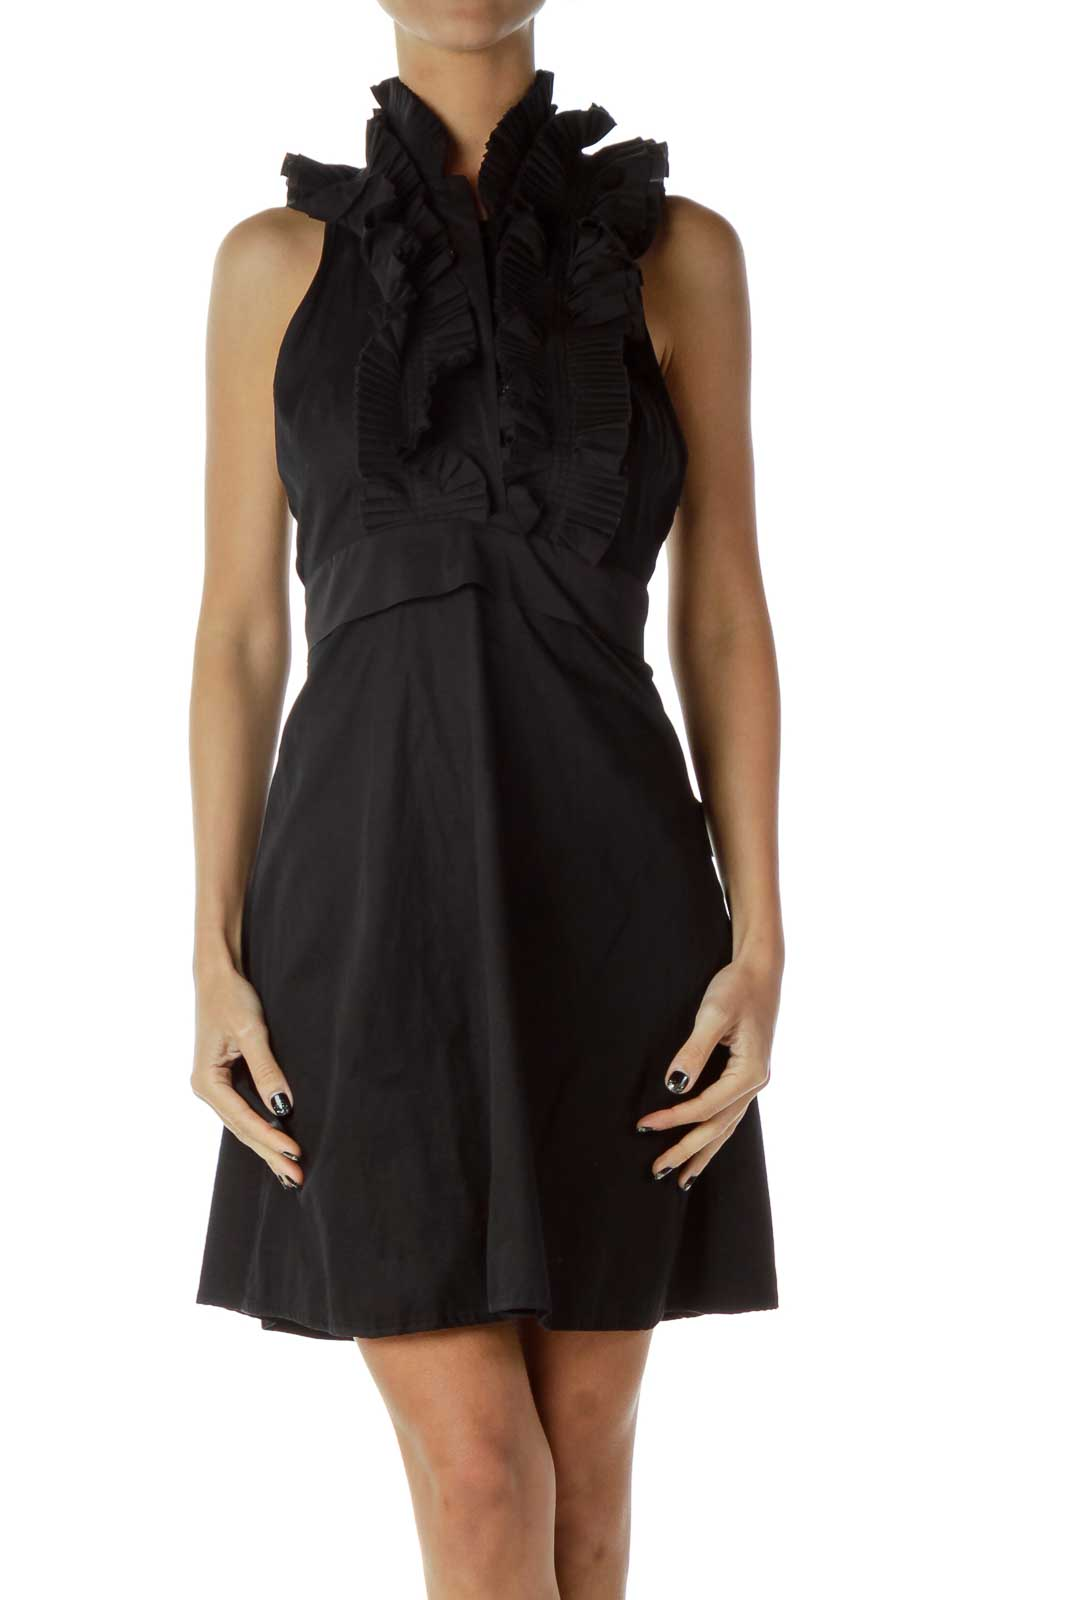 Black Halter Ruffled Dress Front